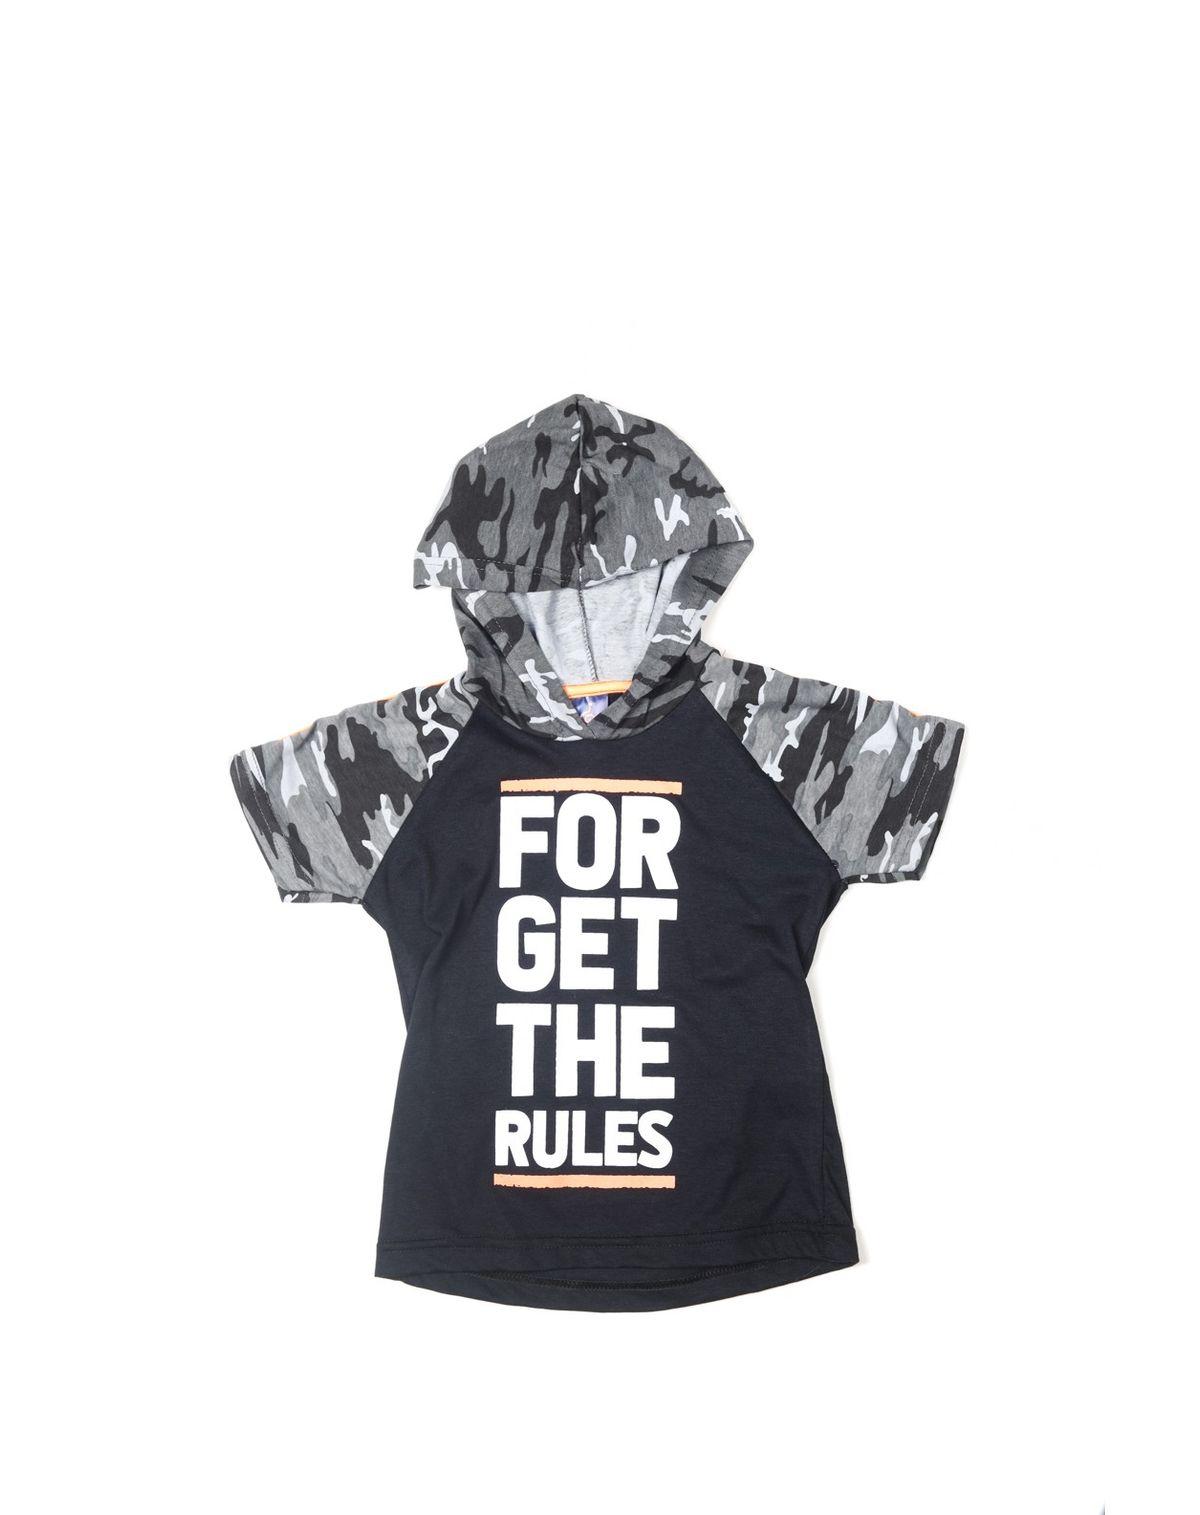 2050005681764-Camiseta-Manga-Curta-Bebe-Menino-Recorte-Camuflado-Capuz-PRETO-2-1